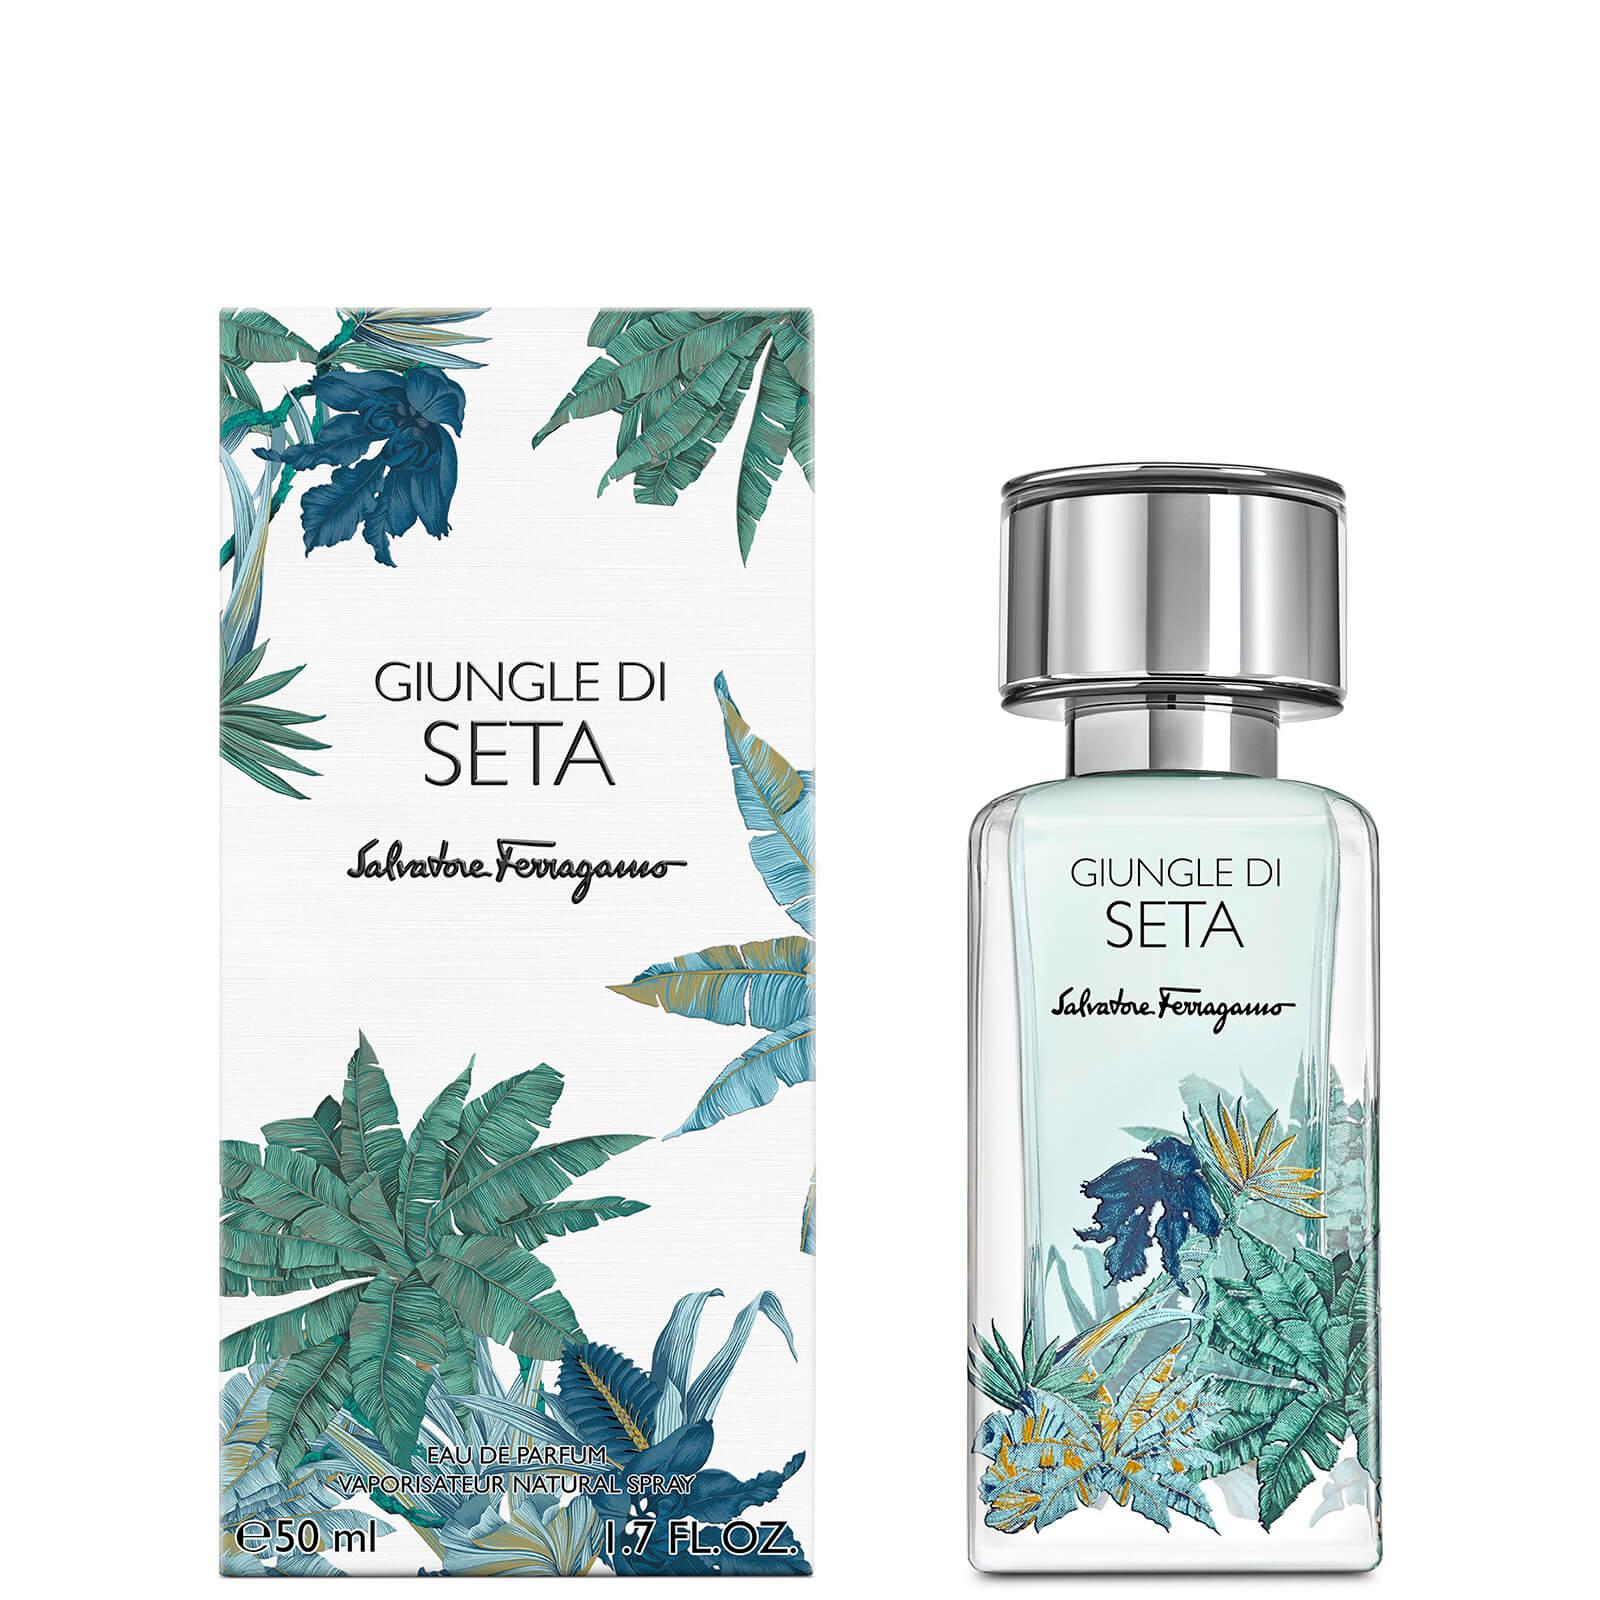 Salvatore Ferragamo Storie Giungle Di Seta Eau de Parfum 50ml